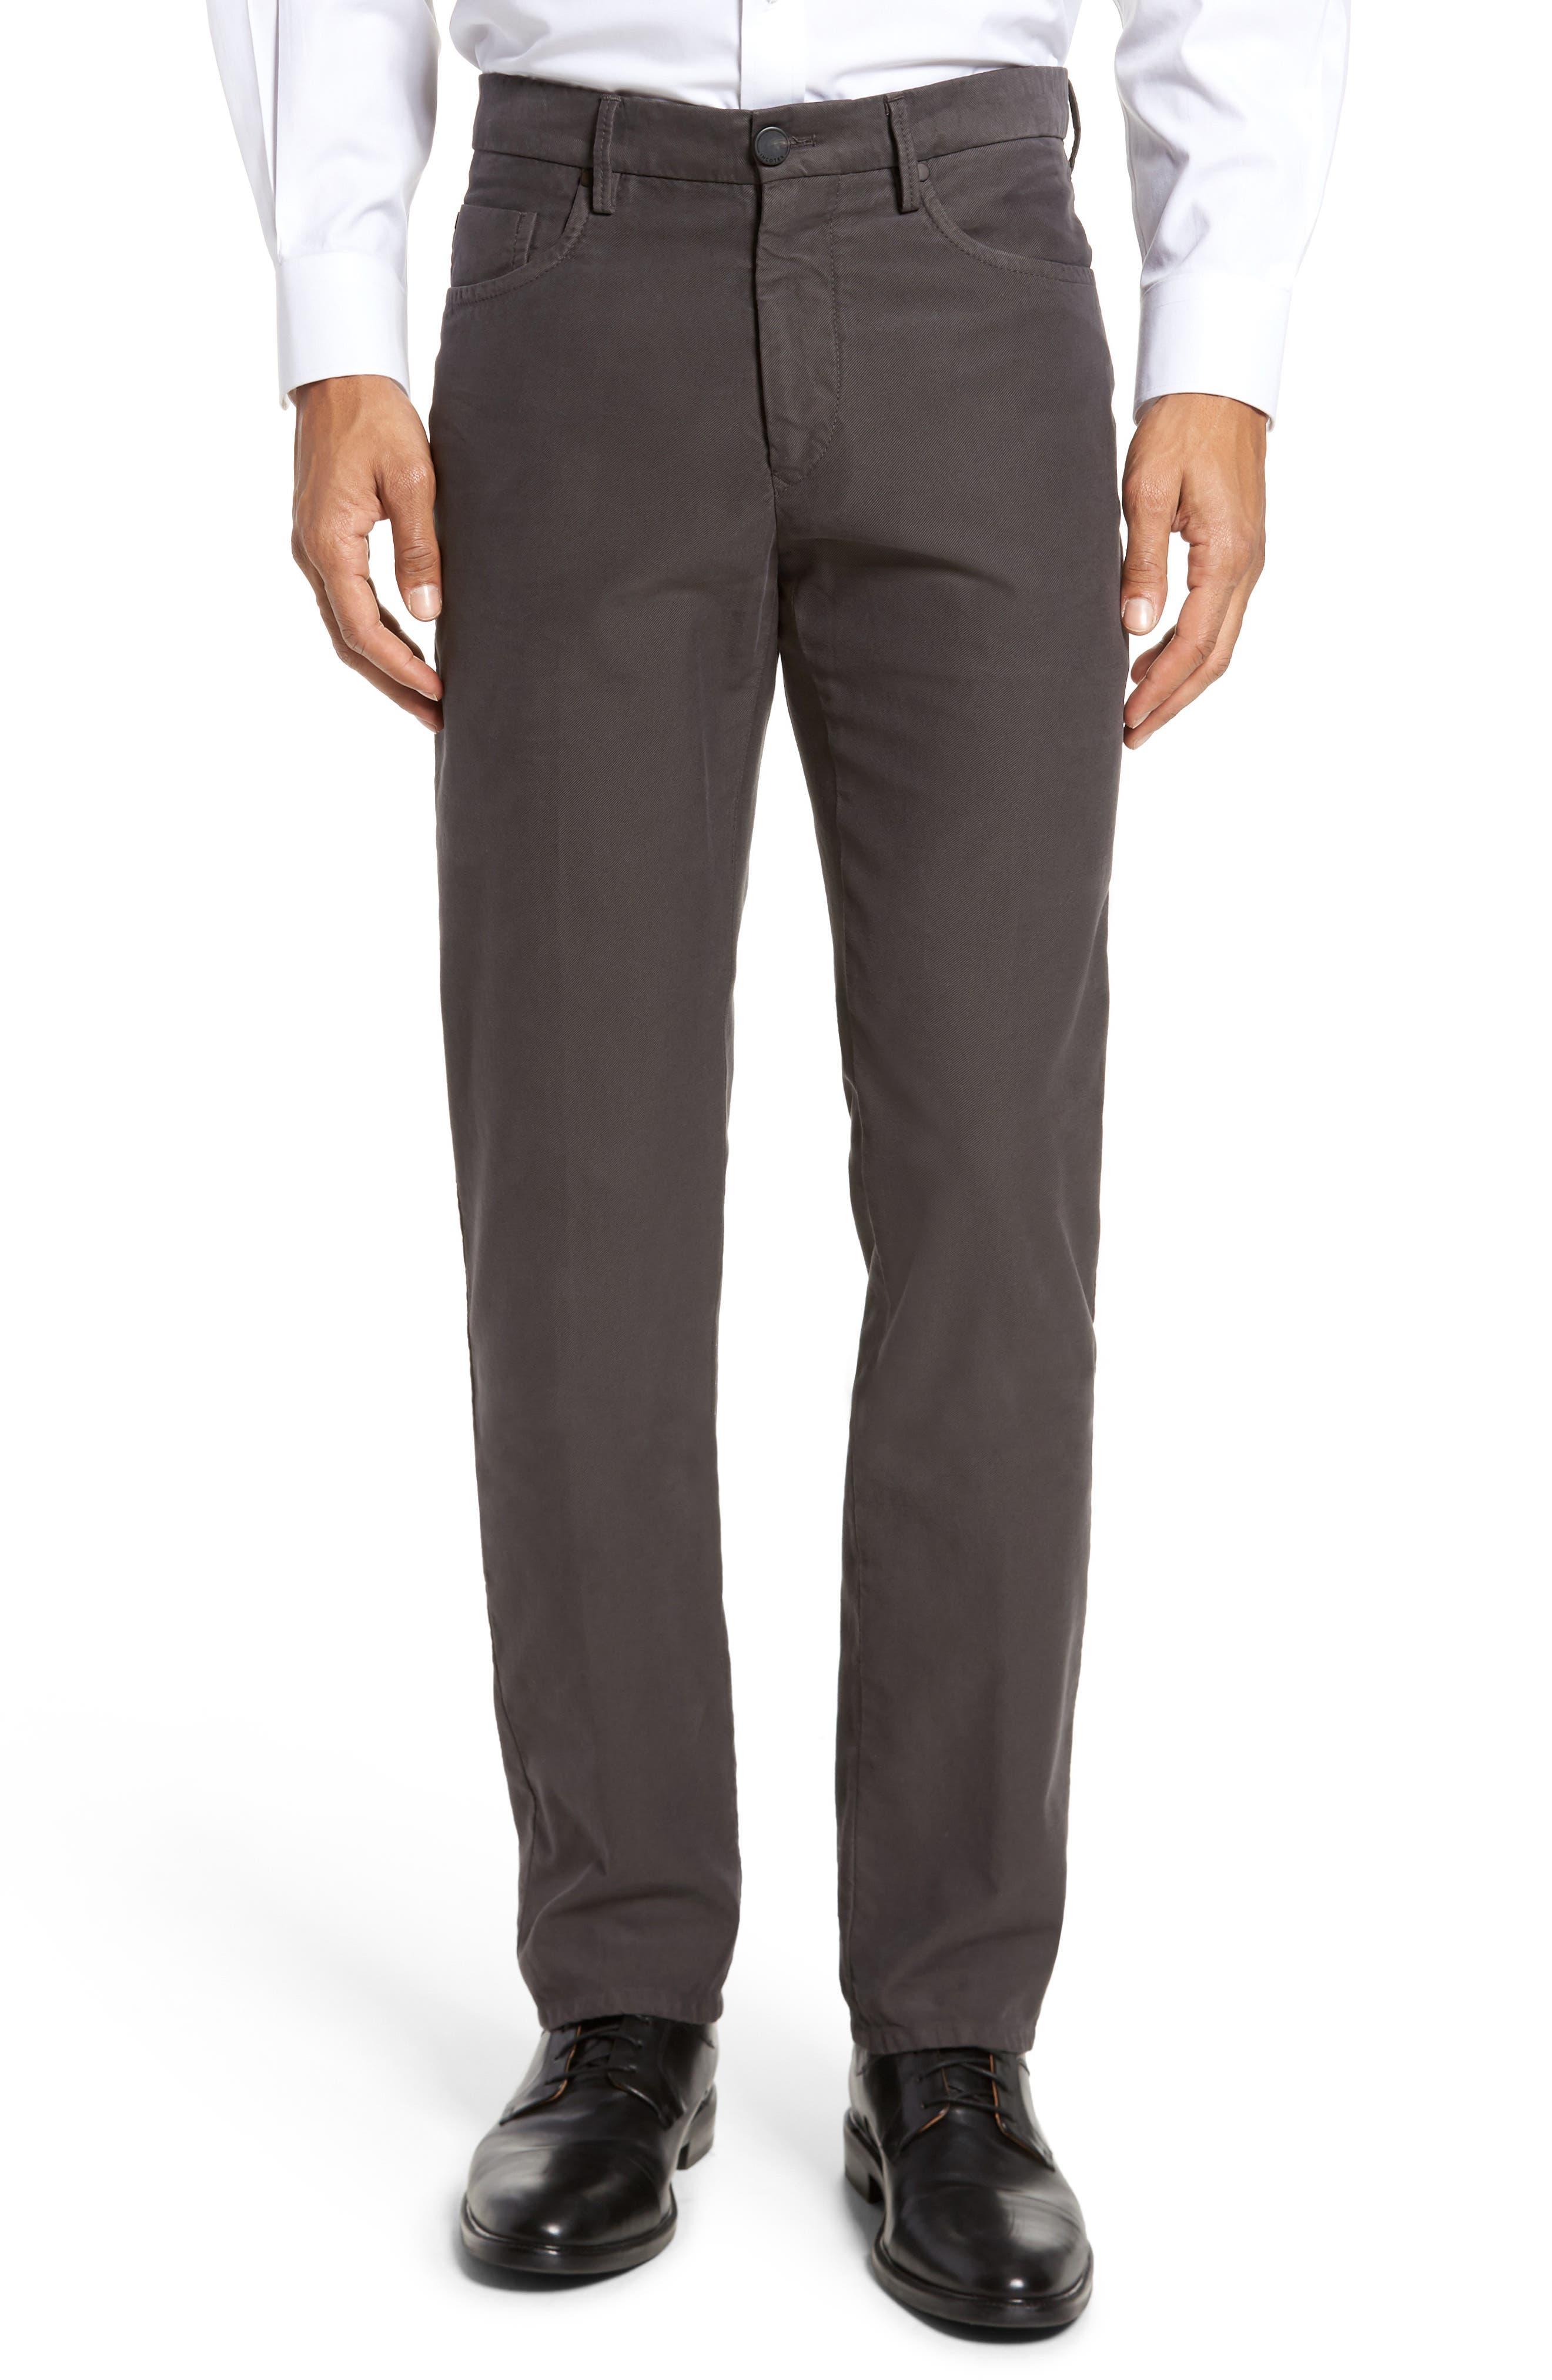 Incotex Cotton Twill Five-Pocket Pants